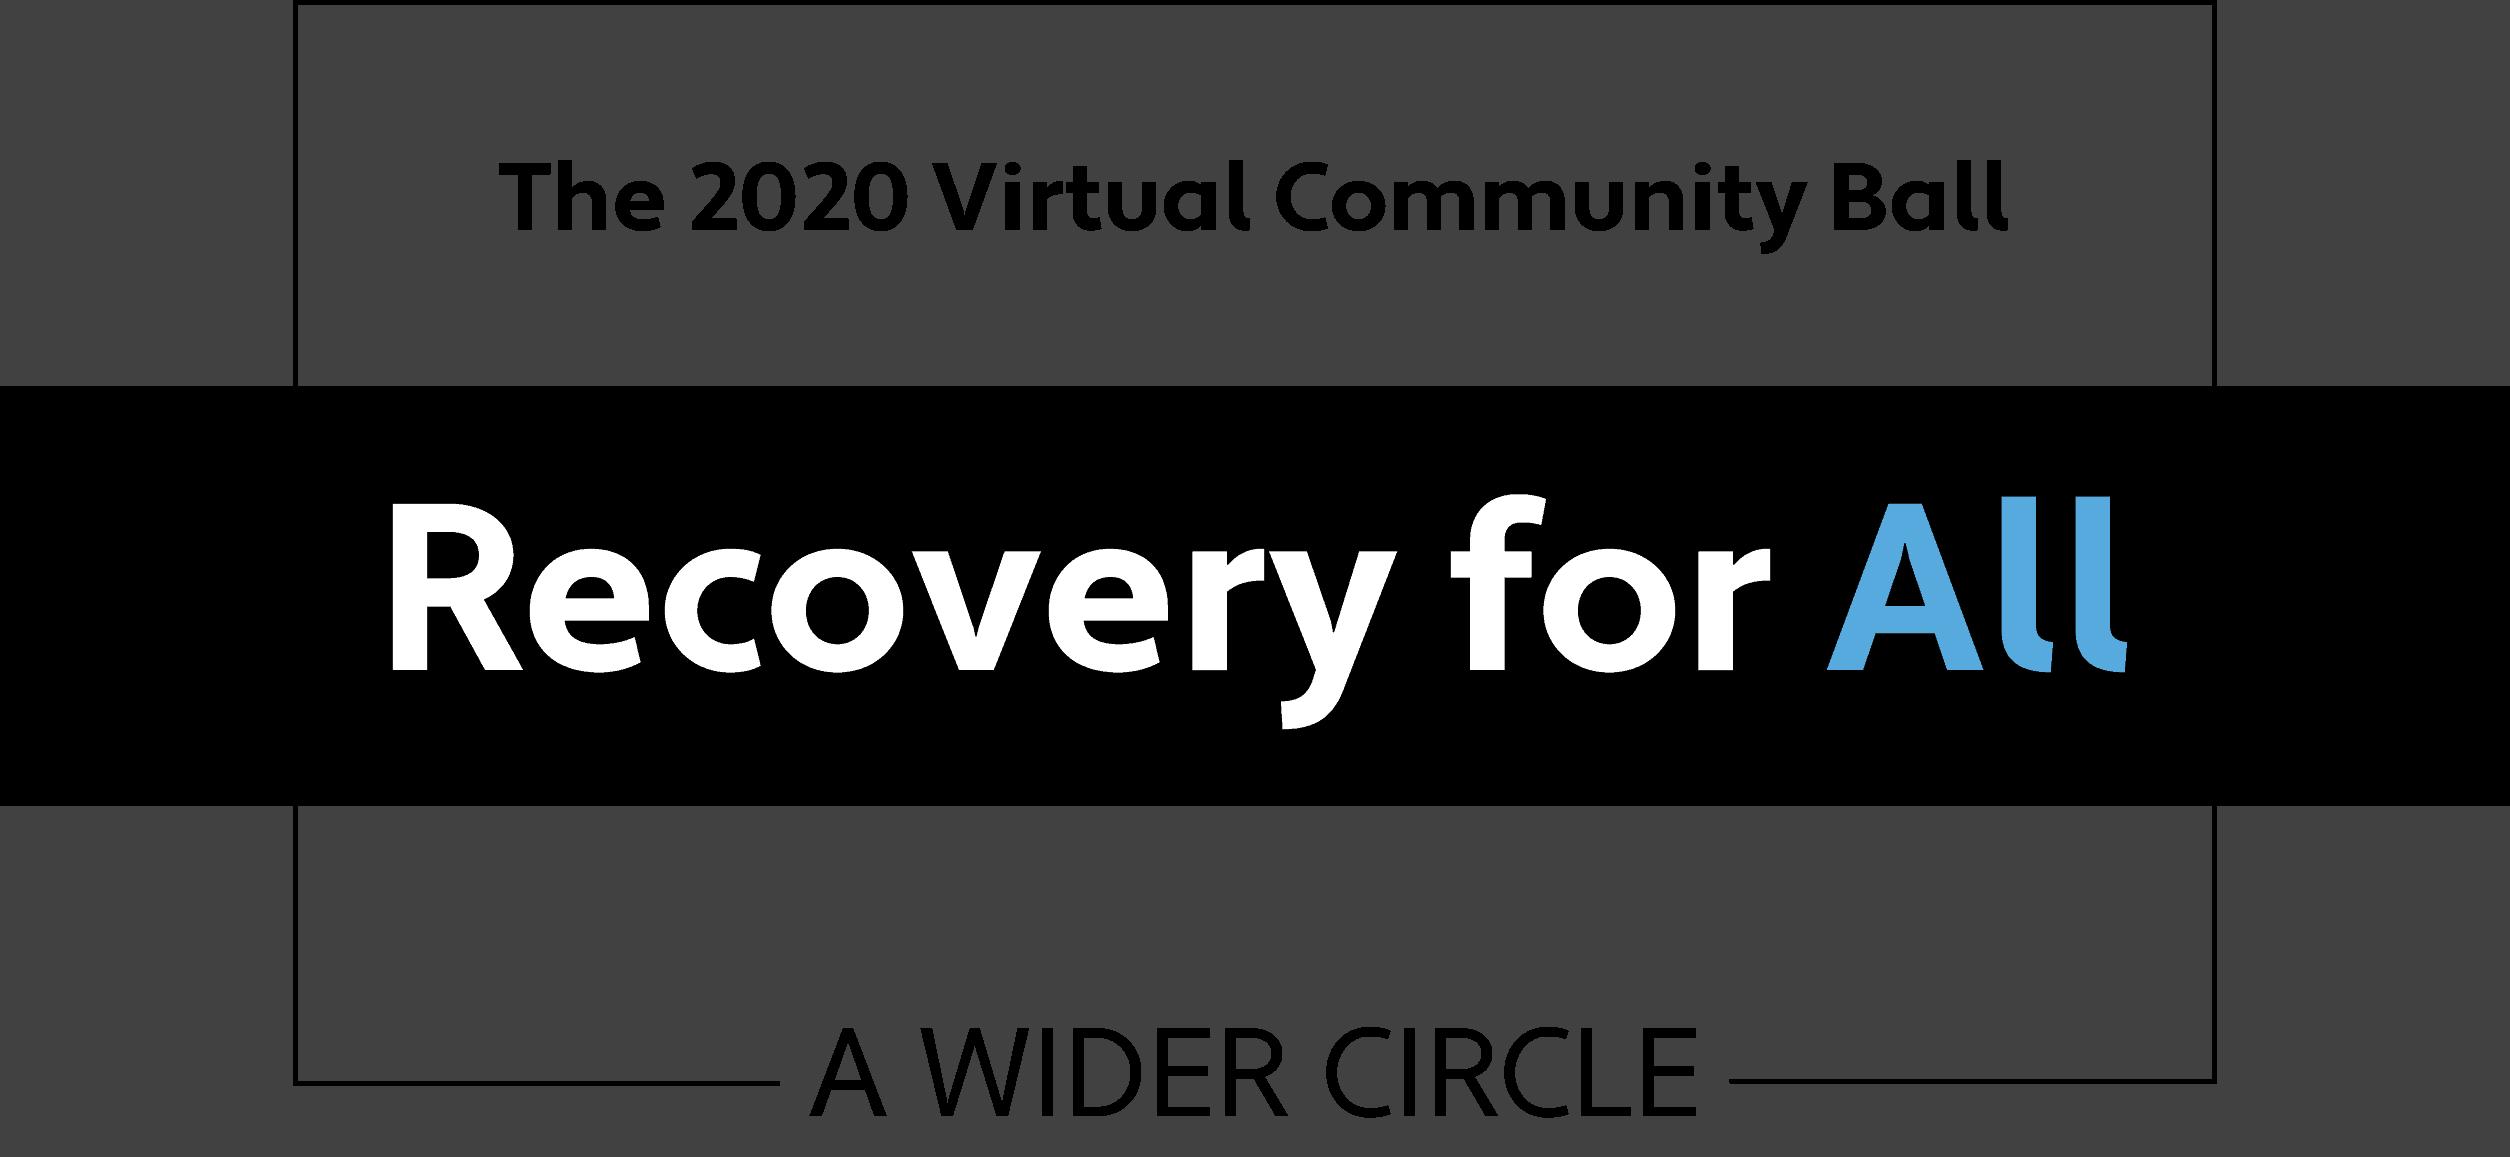 A Wider Circle - 2020 Virtual Community Ball